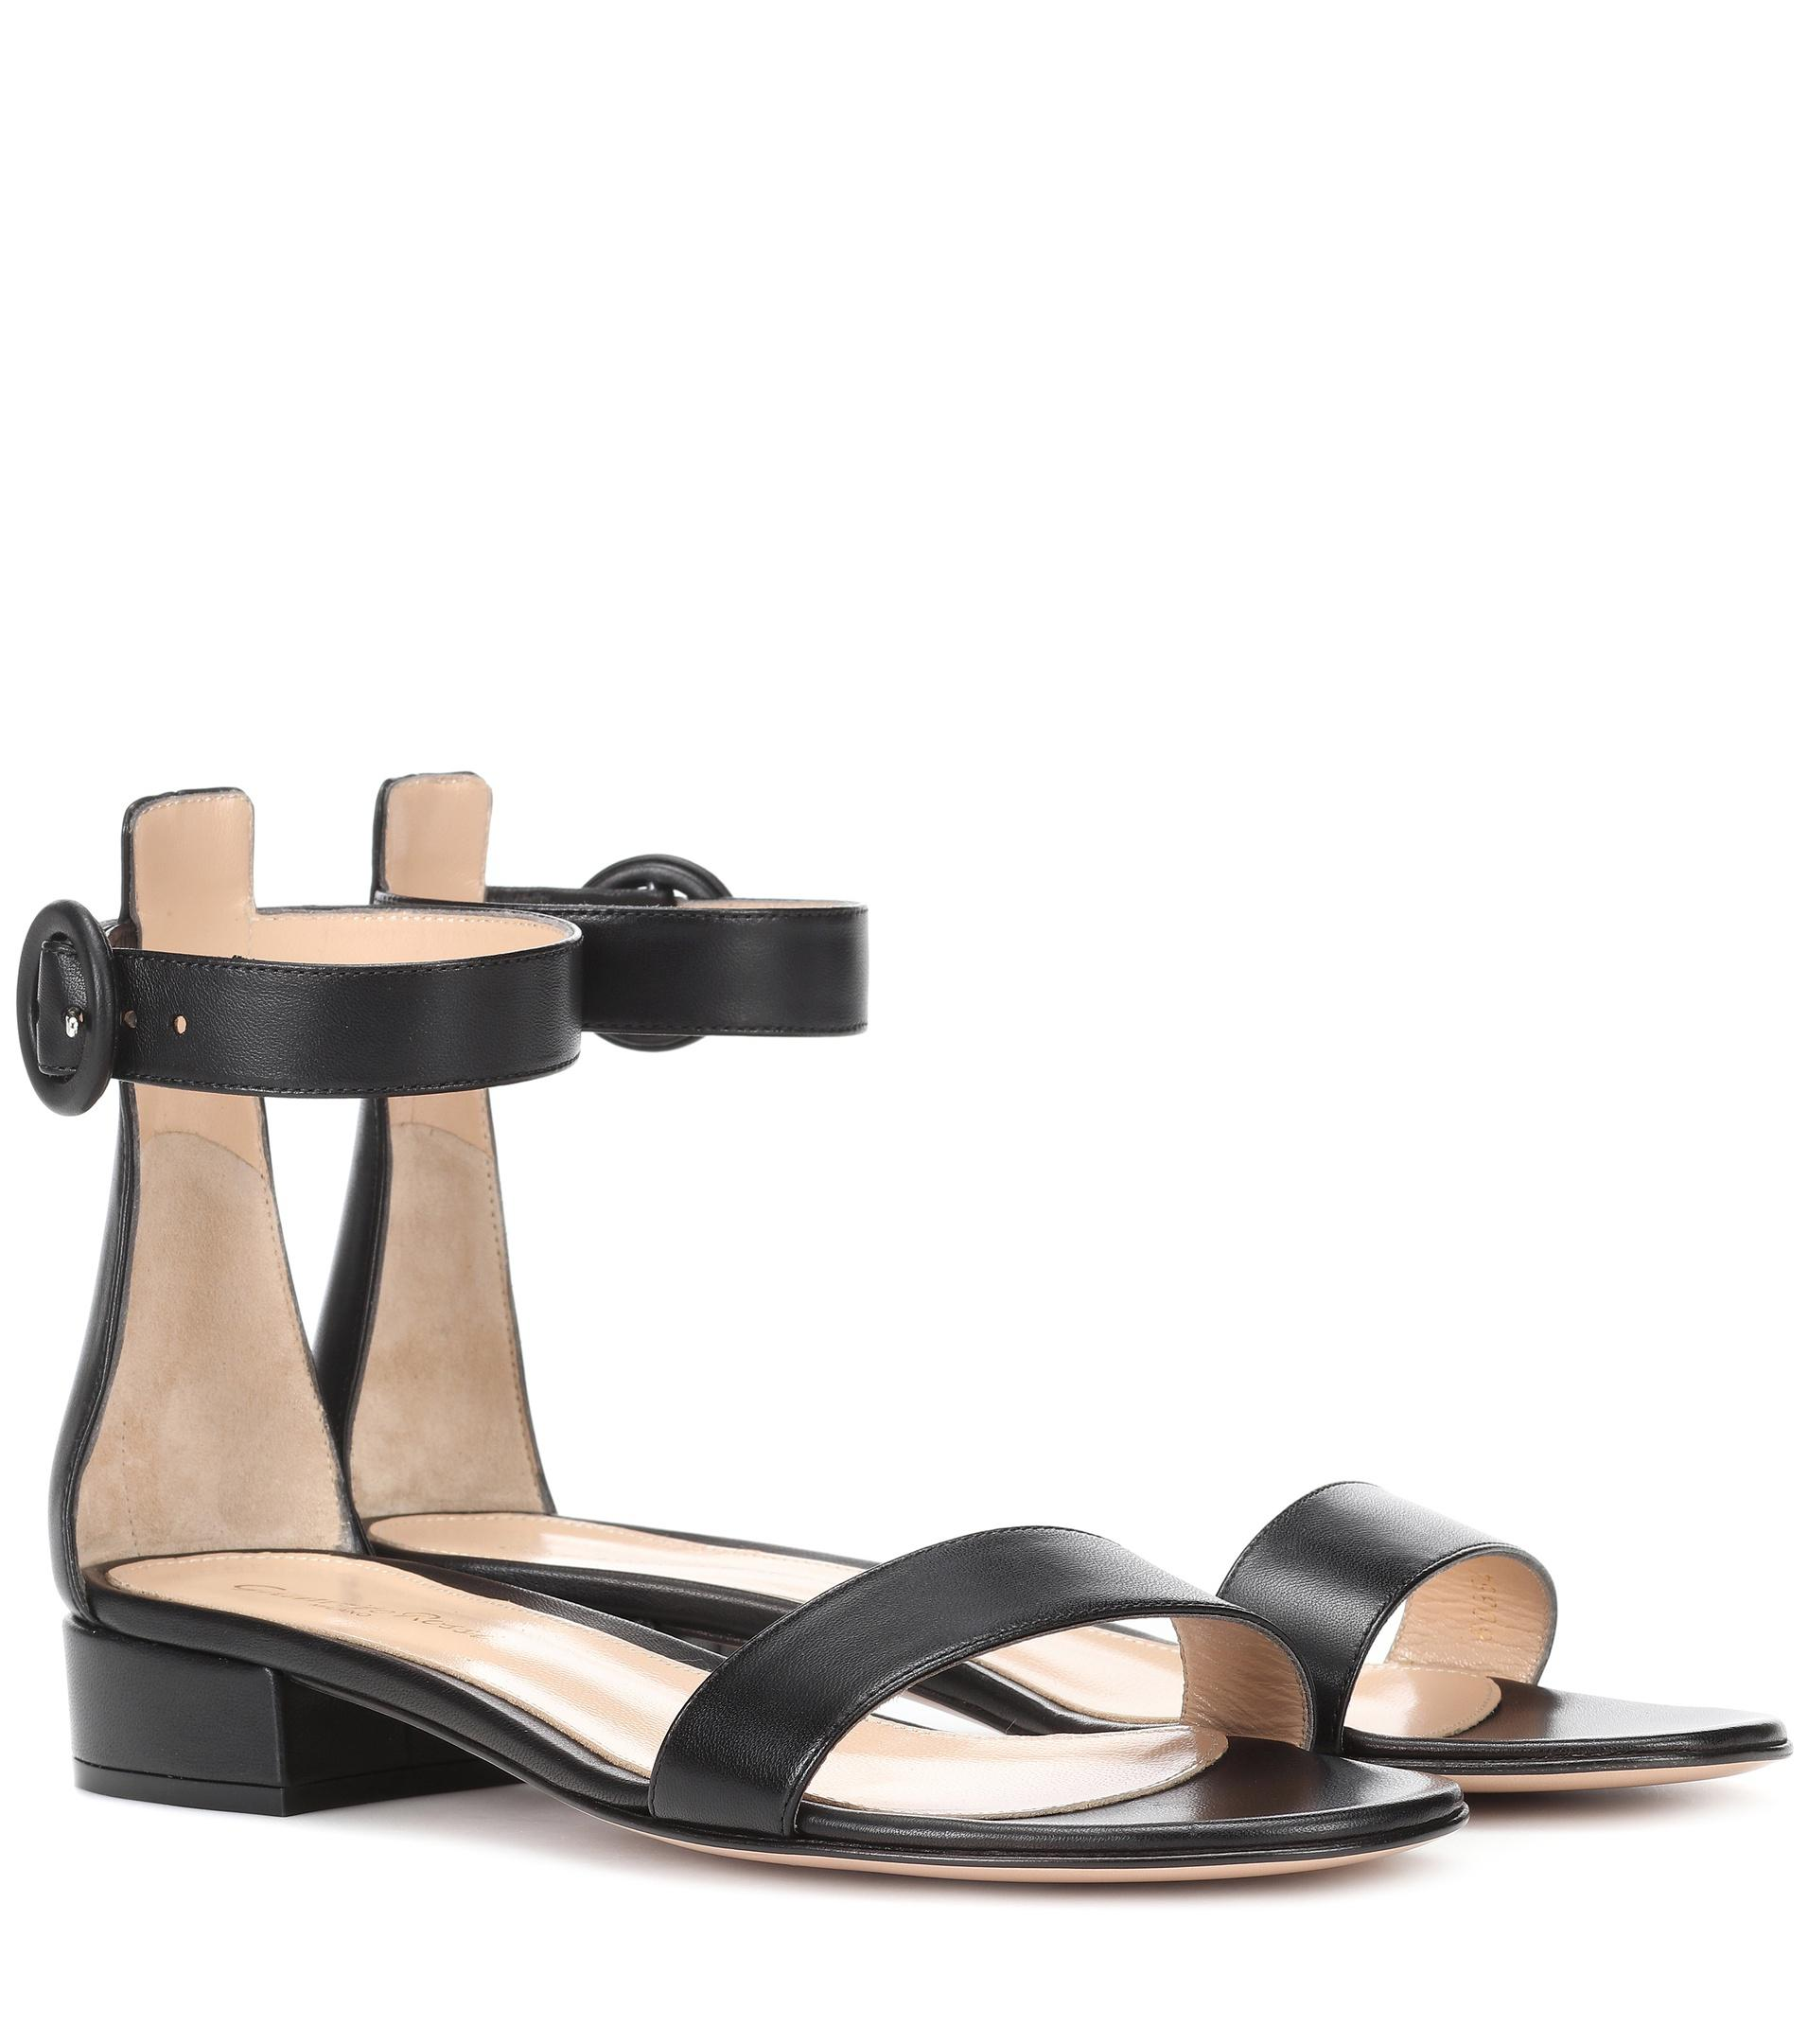 Portofino 20 Leather Sandals - Black Gianvito Rossi CfTXJvHET